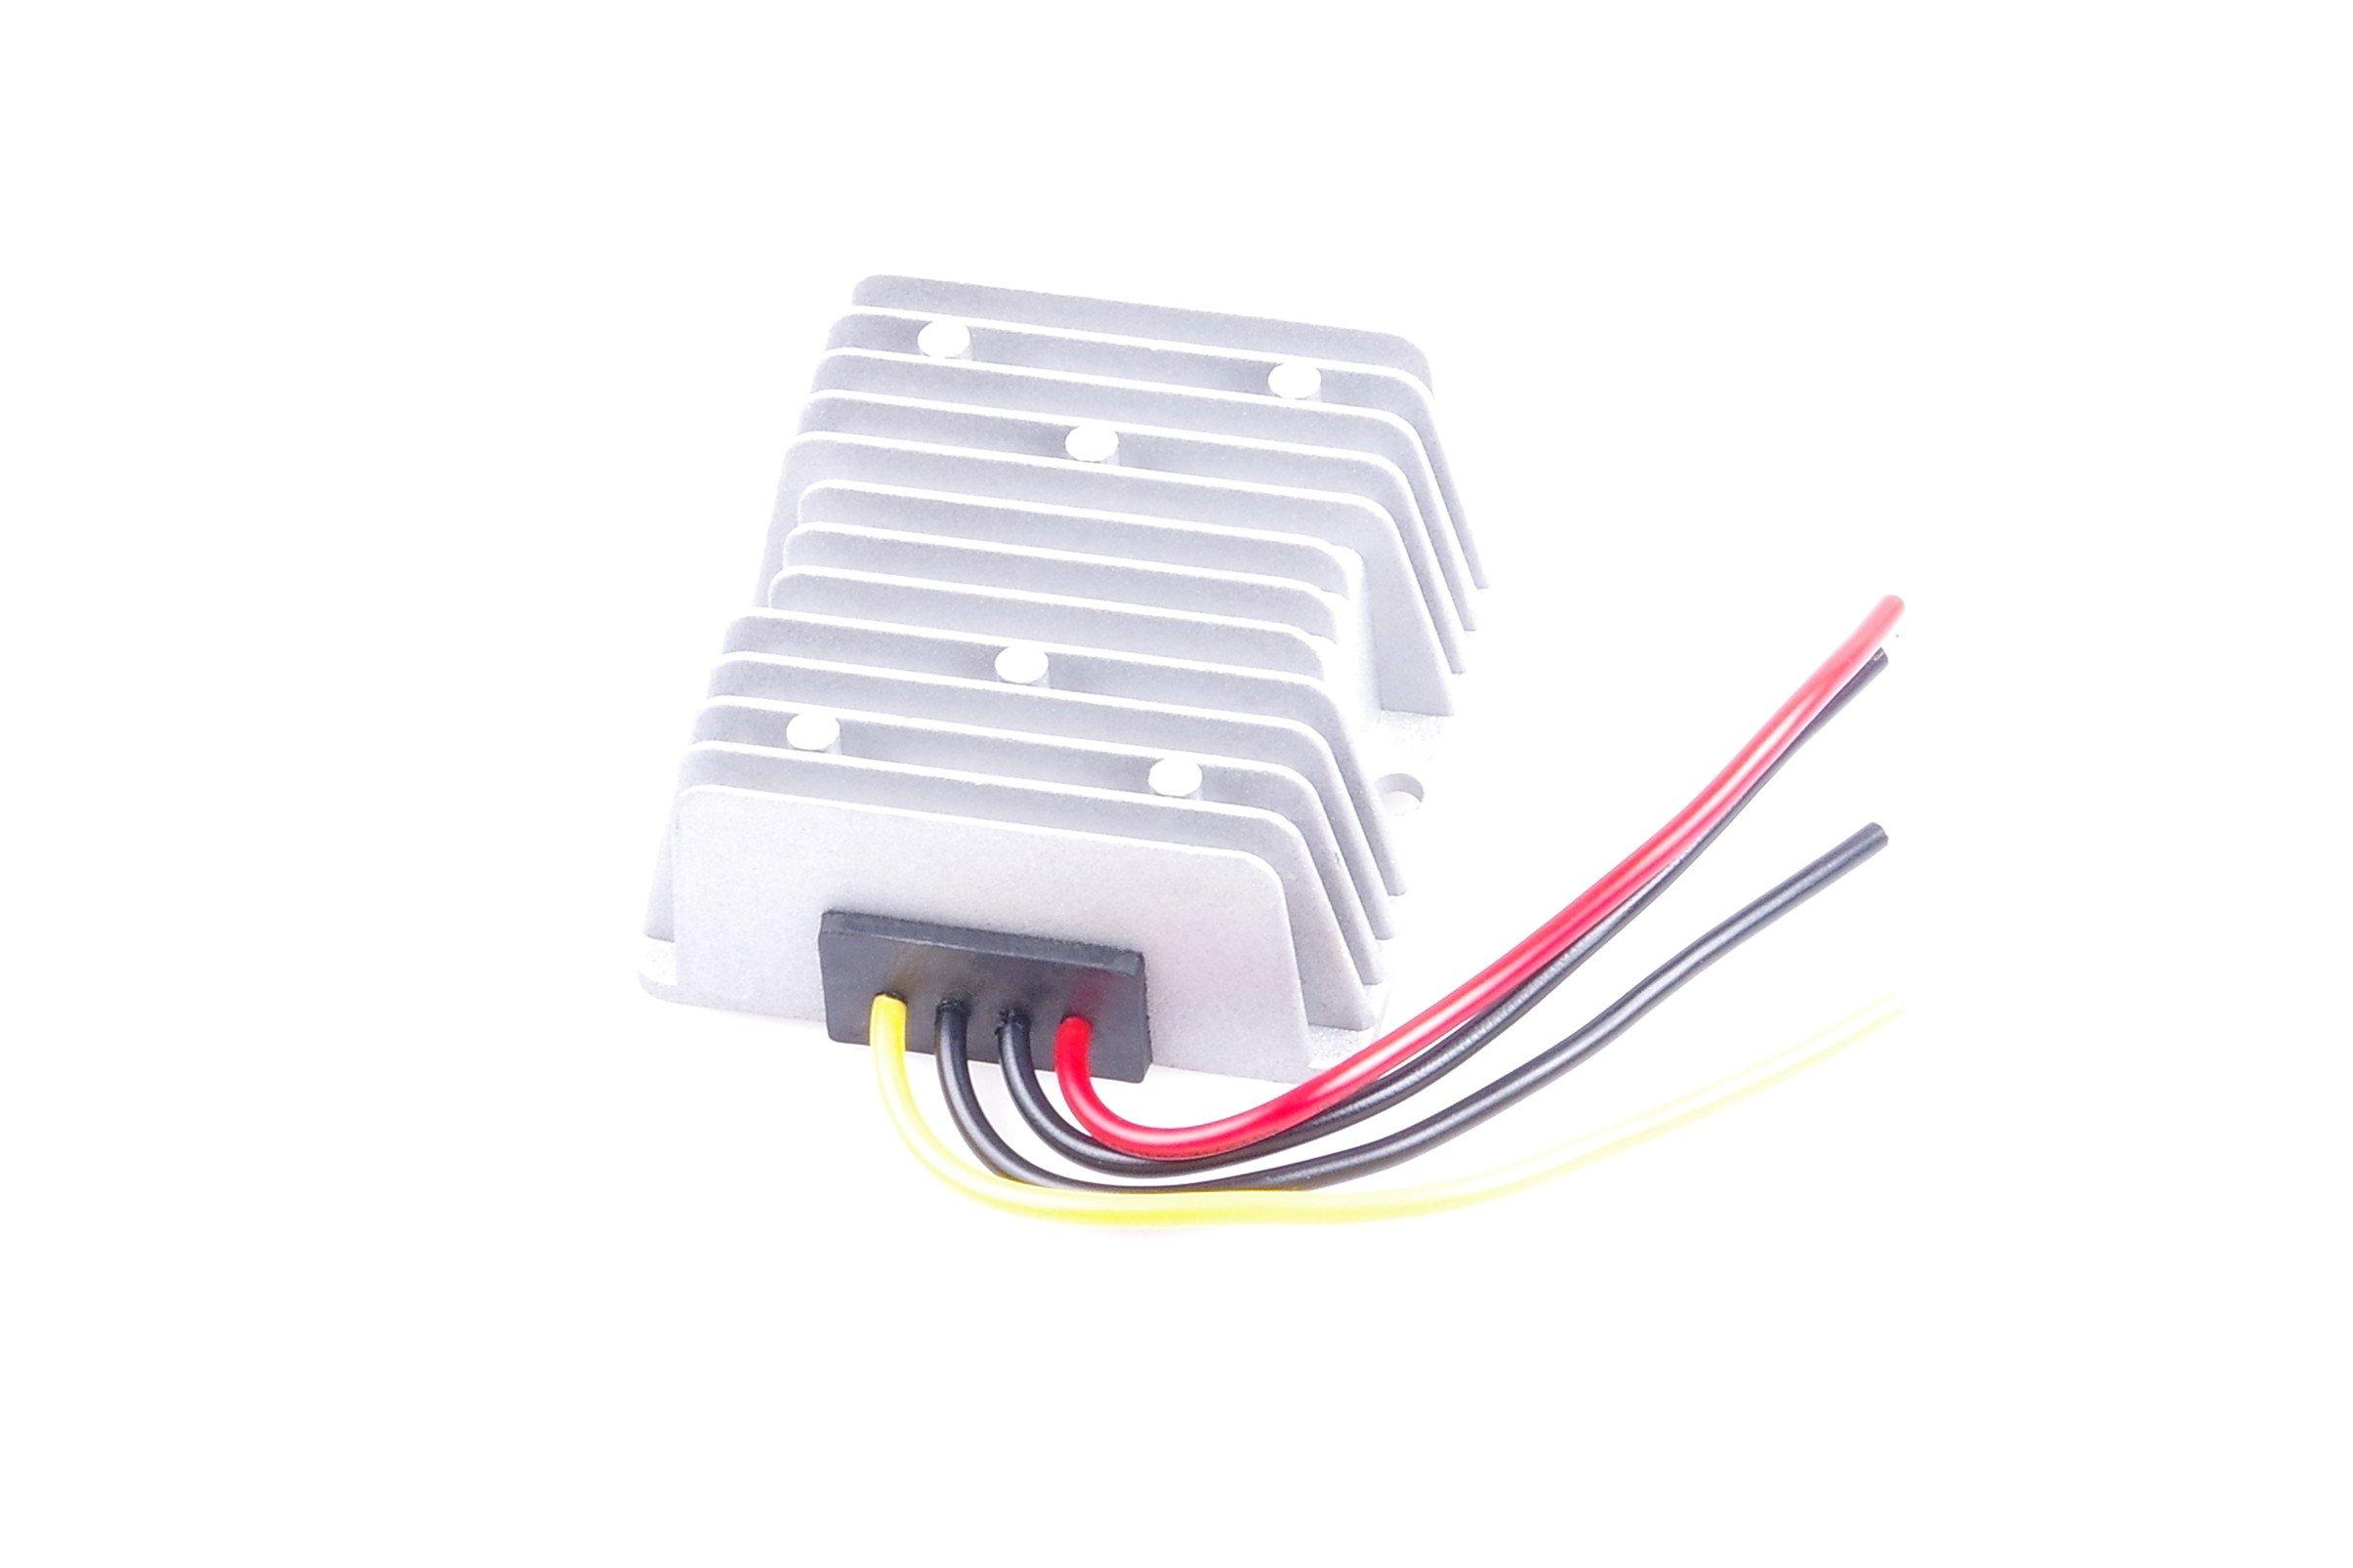 KNACRO DC Converter Regulator 12v 24V 10-30V Step Up to 36V 2A 72W Car Power Supply Module Voltage Converter Regulator Electronic Power Supply Transformer Volt Module